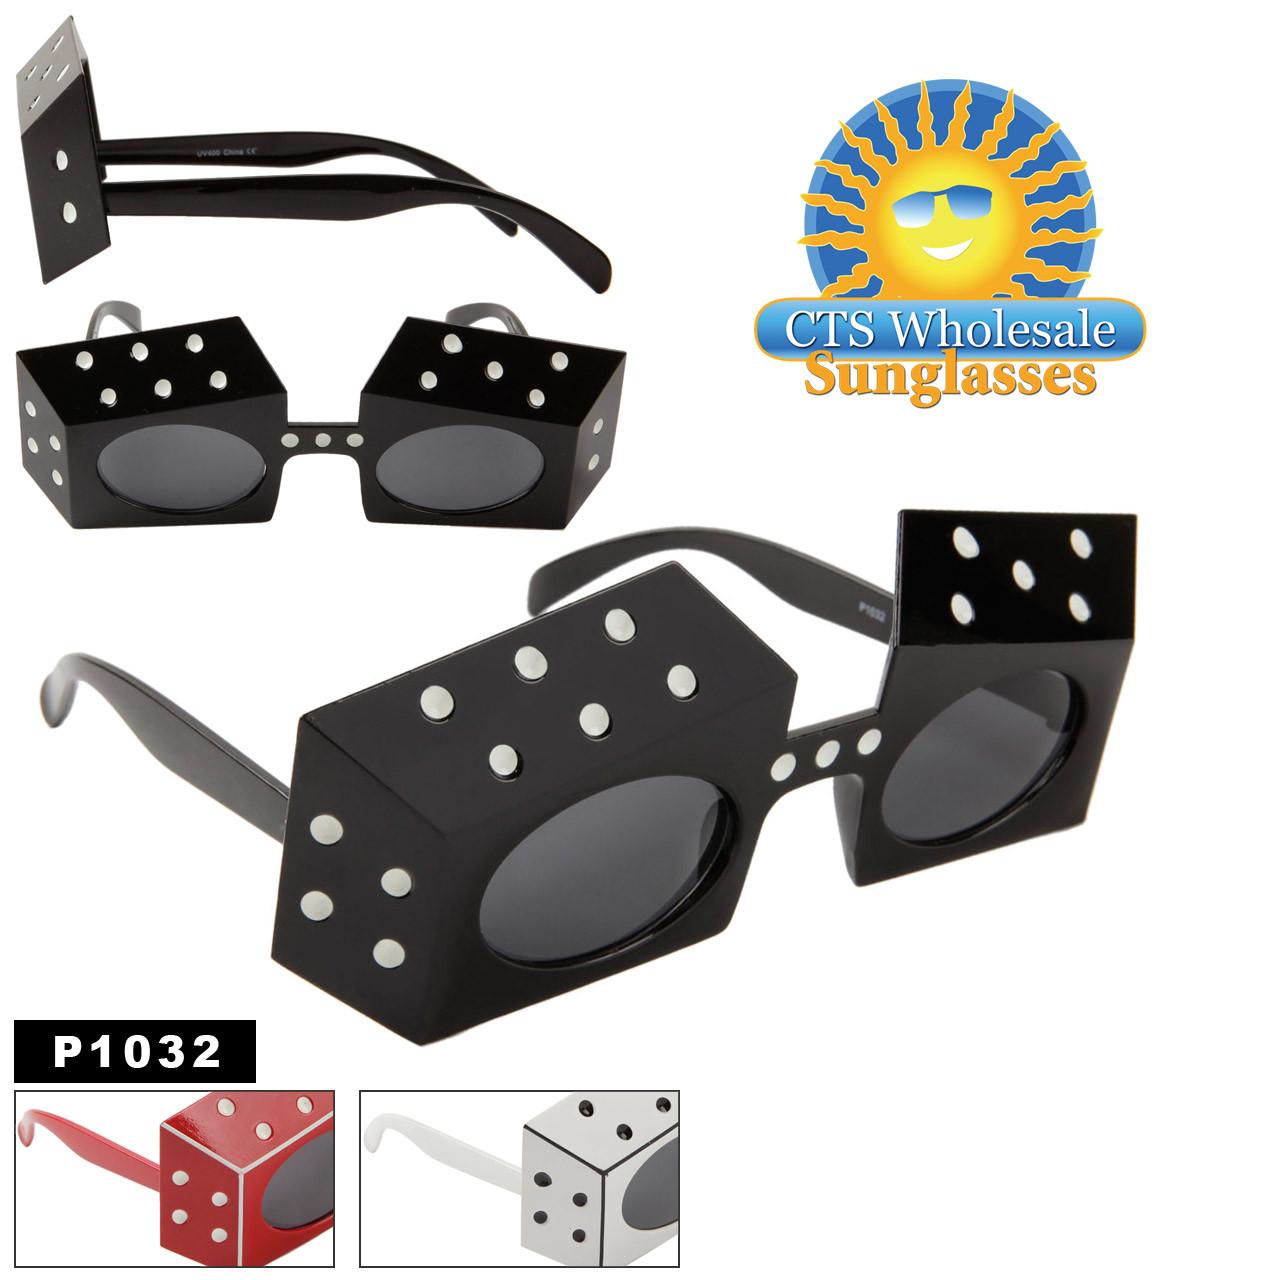 Dice Sunglasses